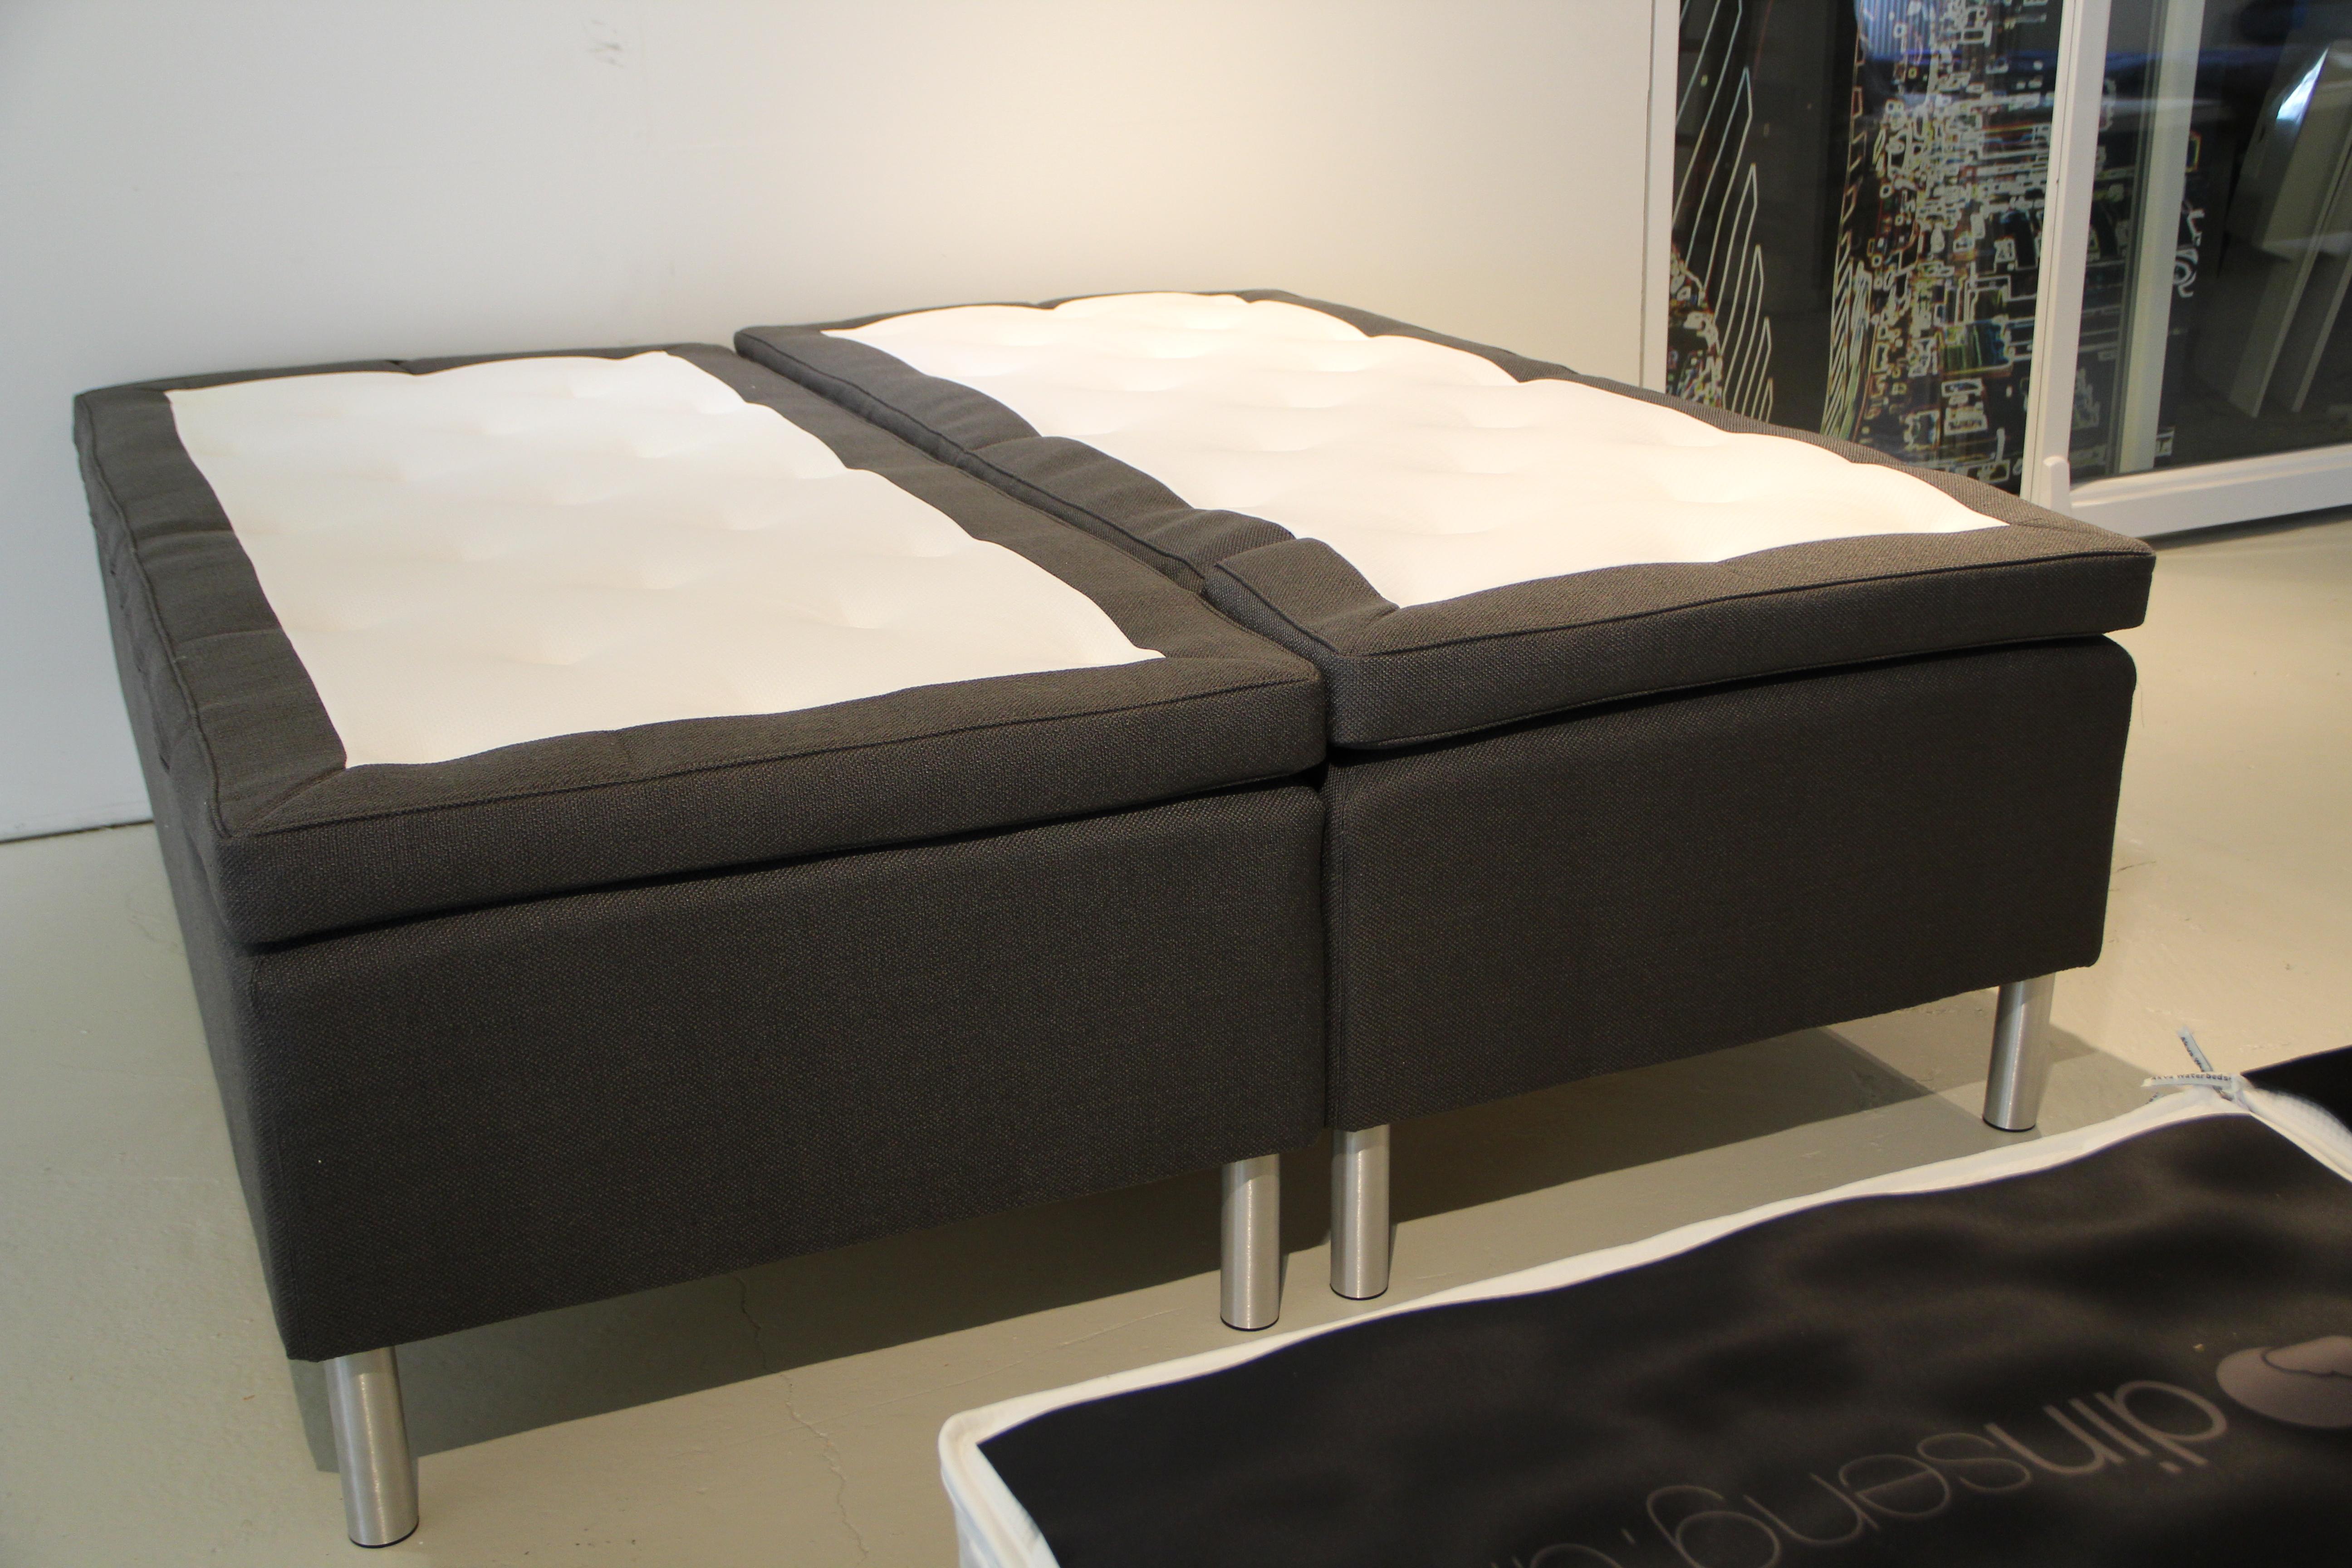 Boxmadras, 2017 model (180x200)